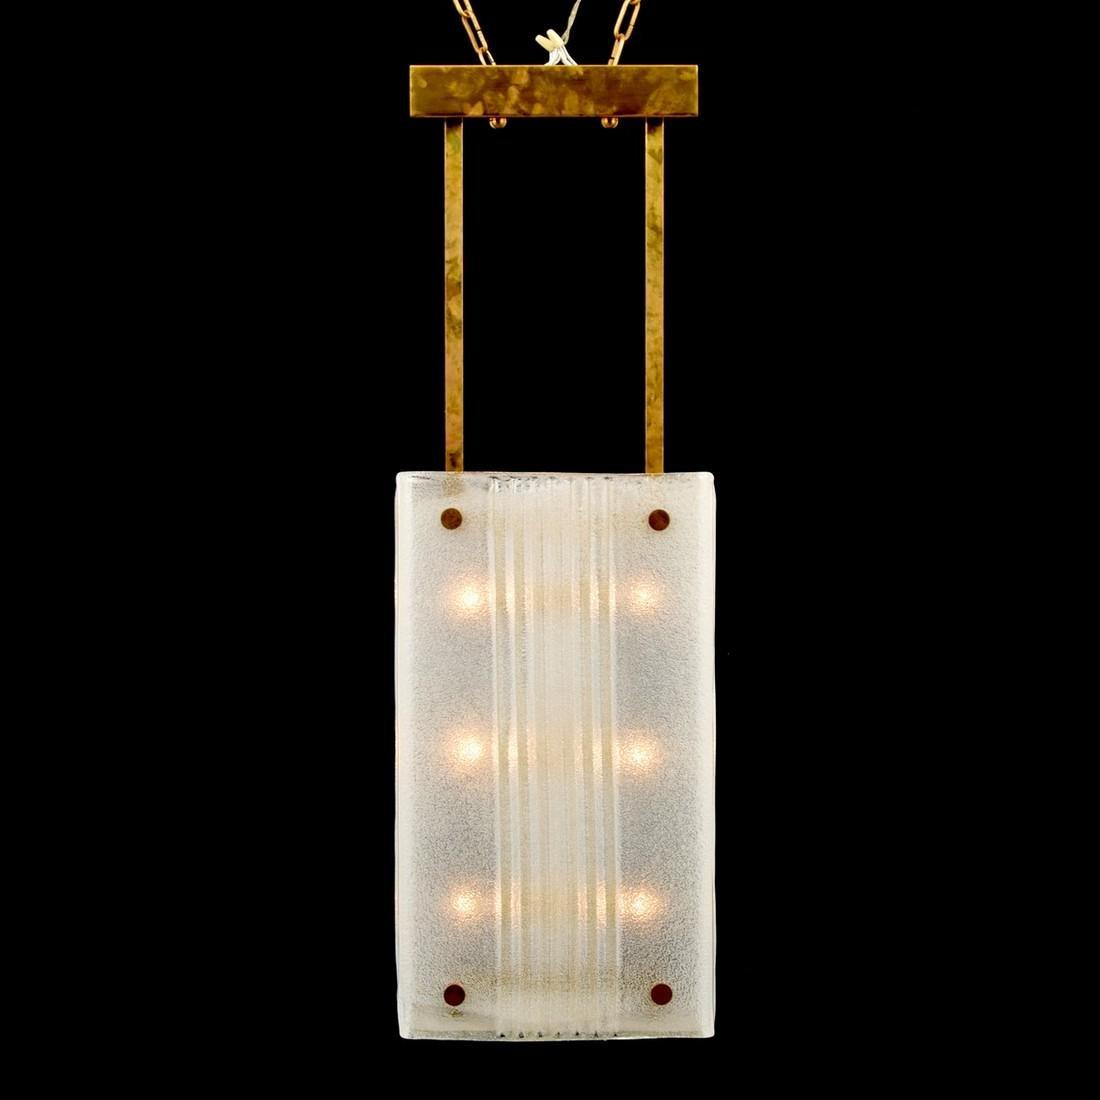 Massive Murano Pendant Light, Manner of Barovier & Toso